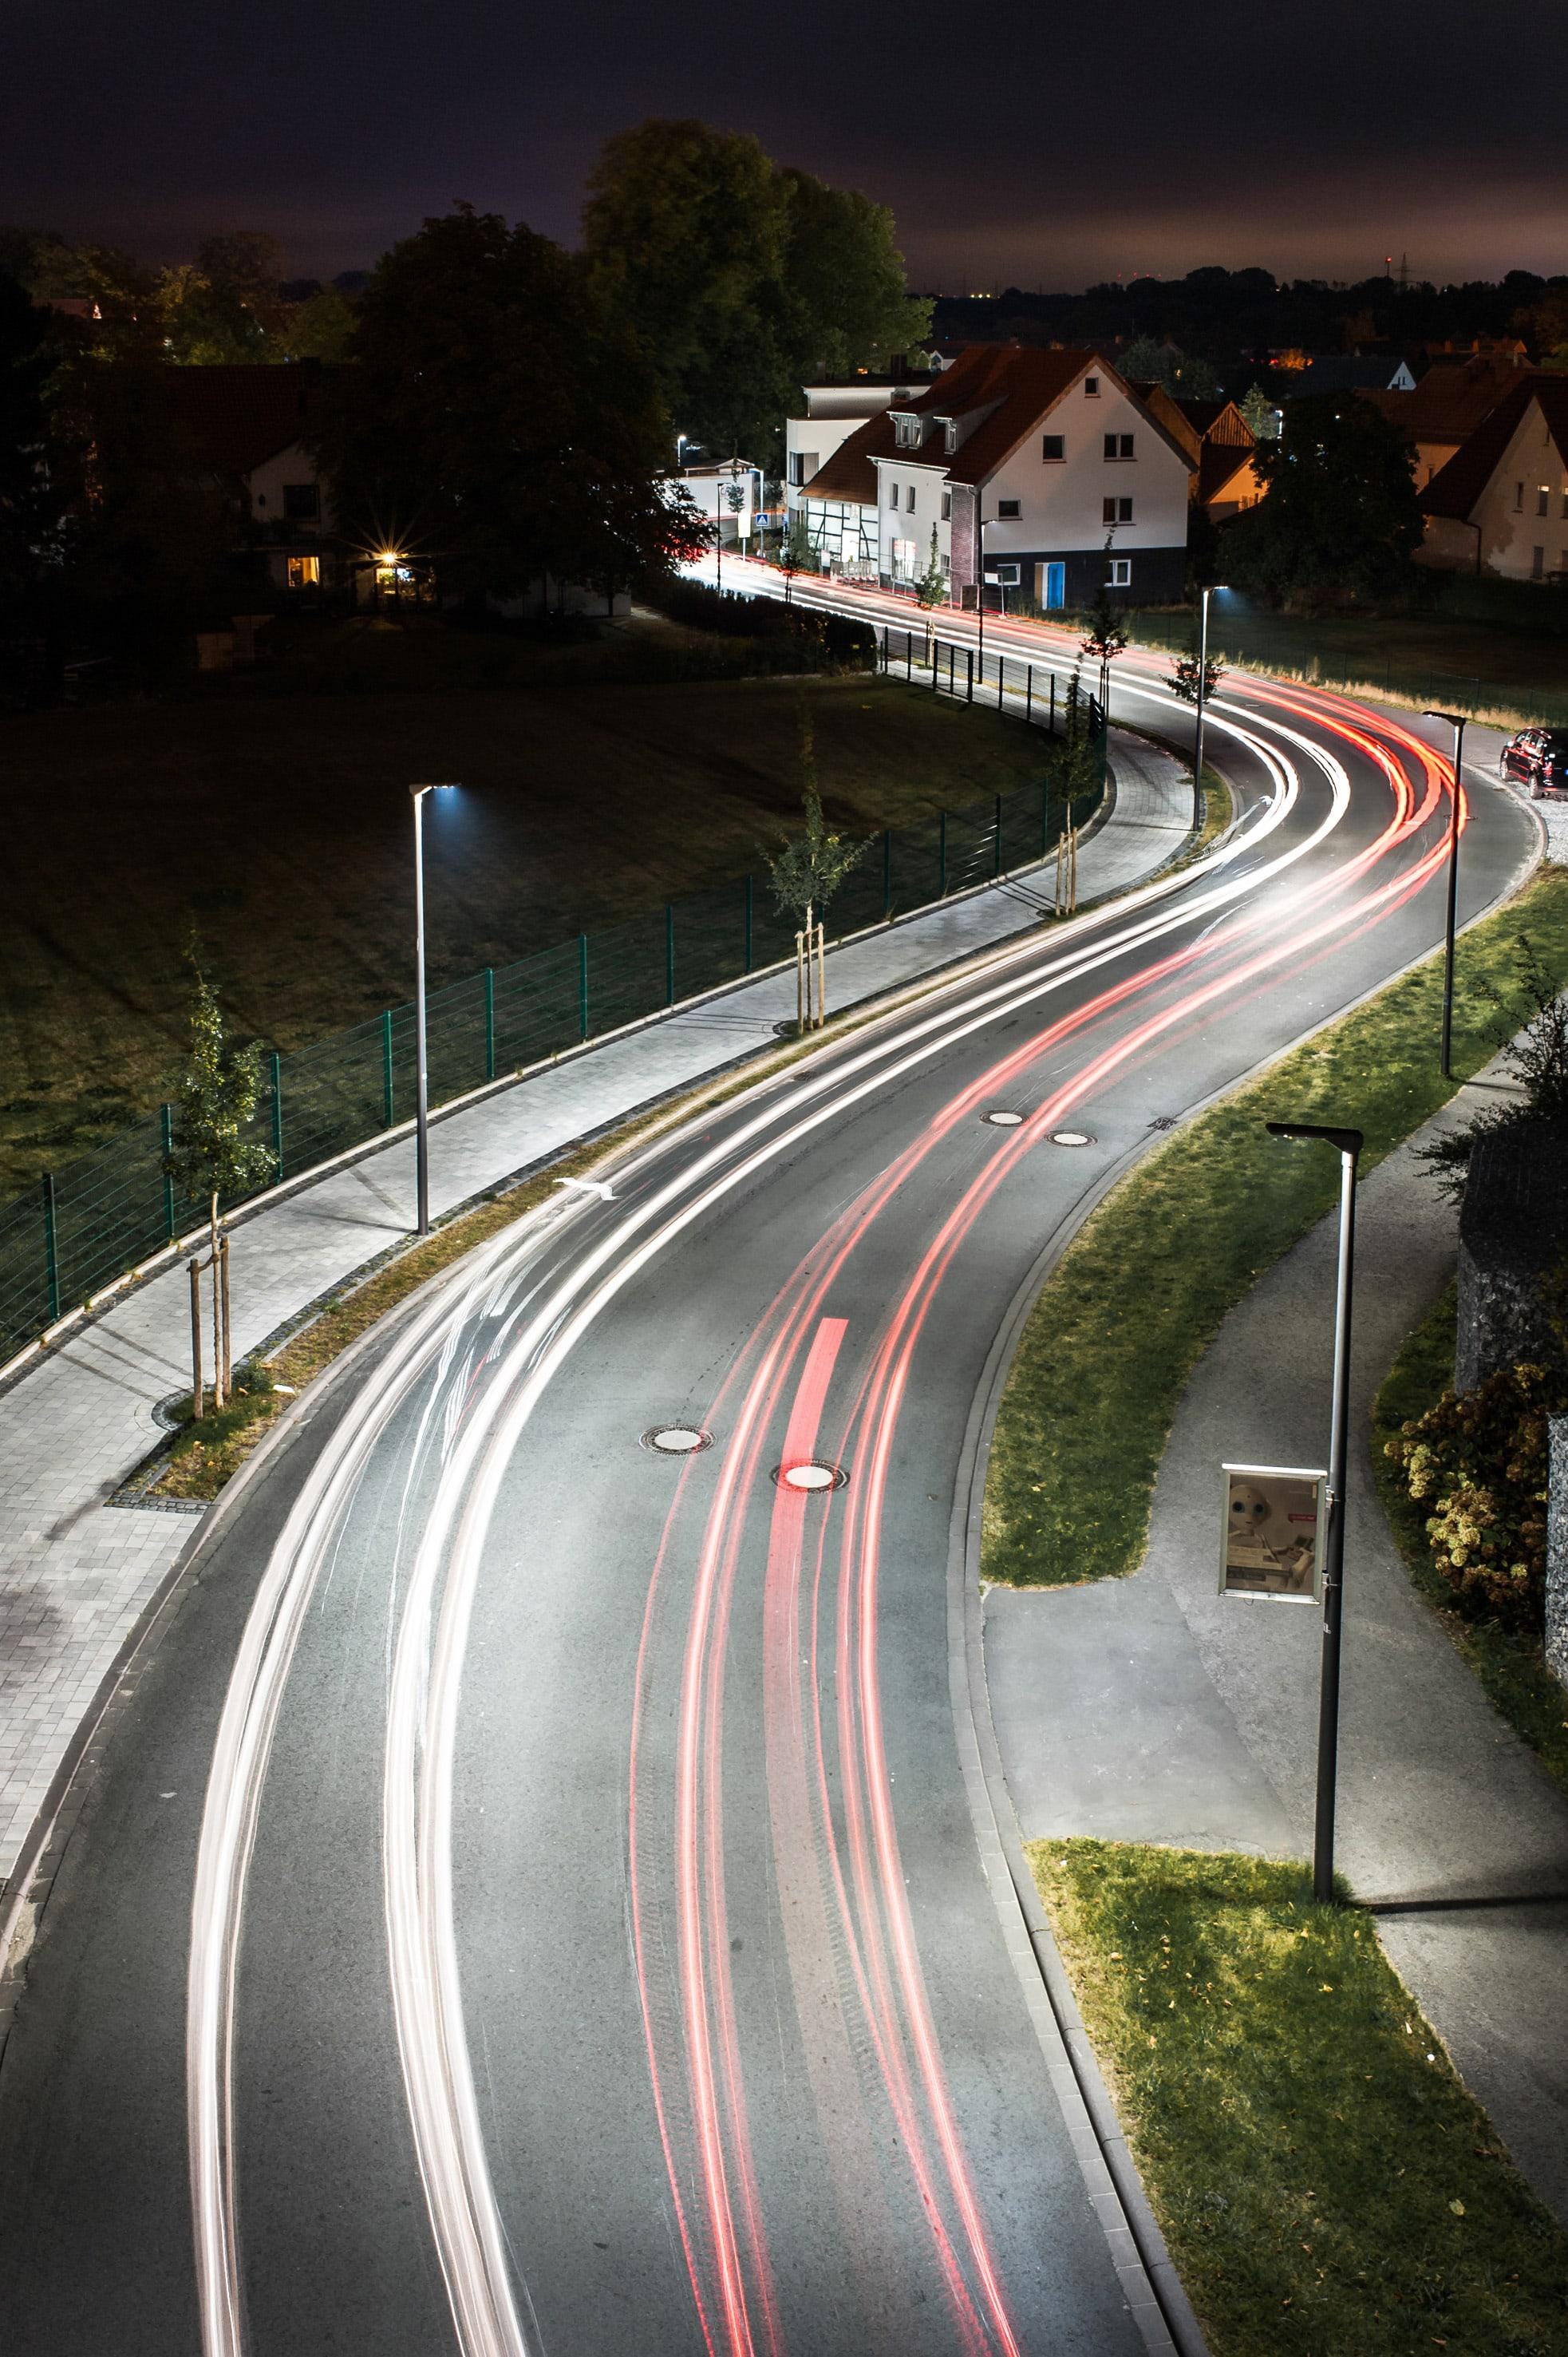 Led street lighting roadway lighting led street lamps fixtures led street lighting bulbs smart street lighting led roadway lighting design led street arubaitofo Image collections